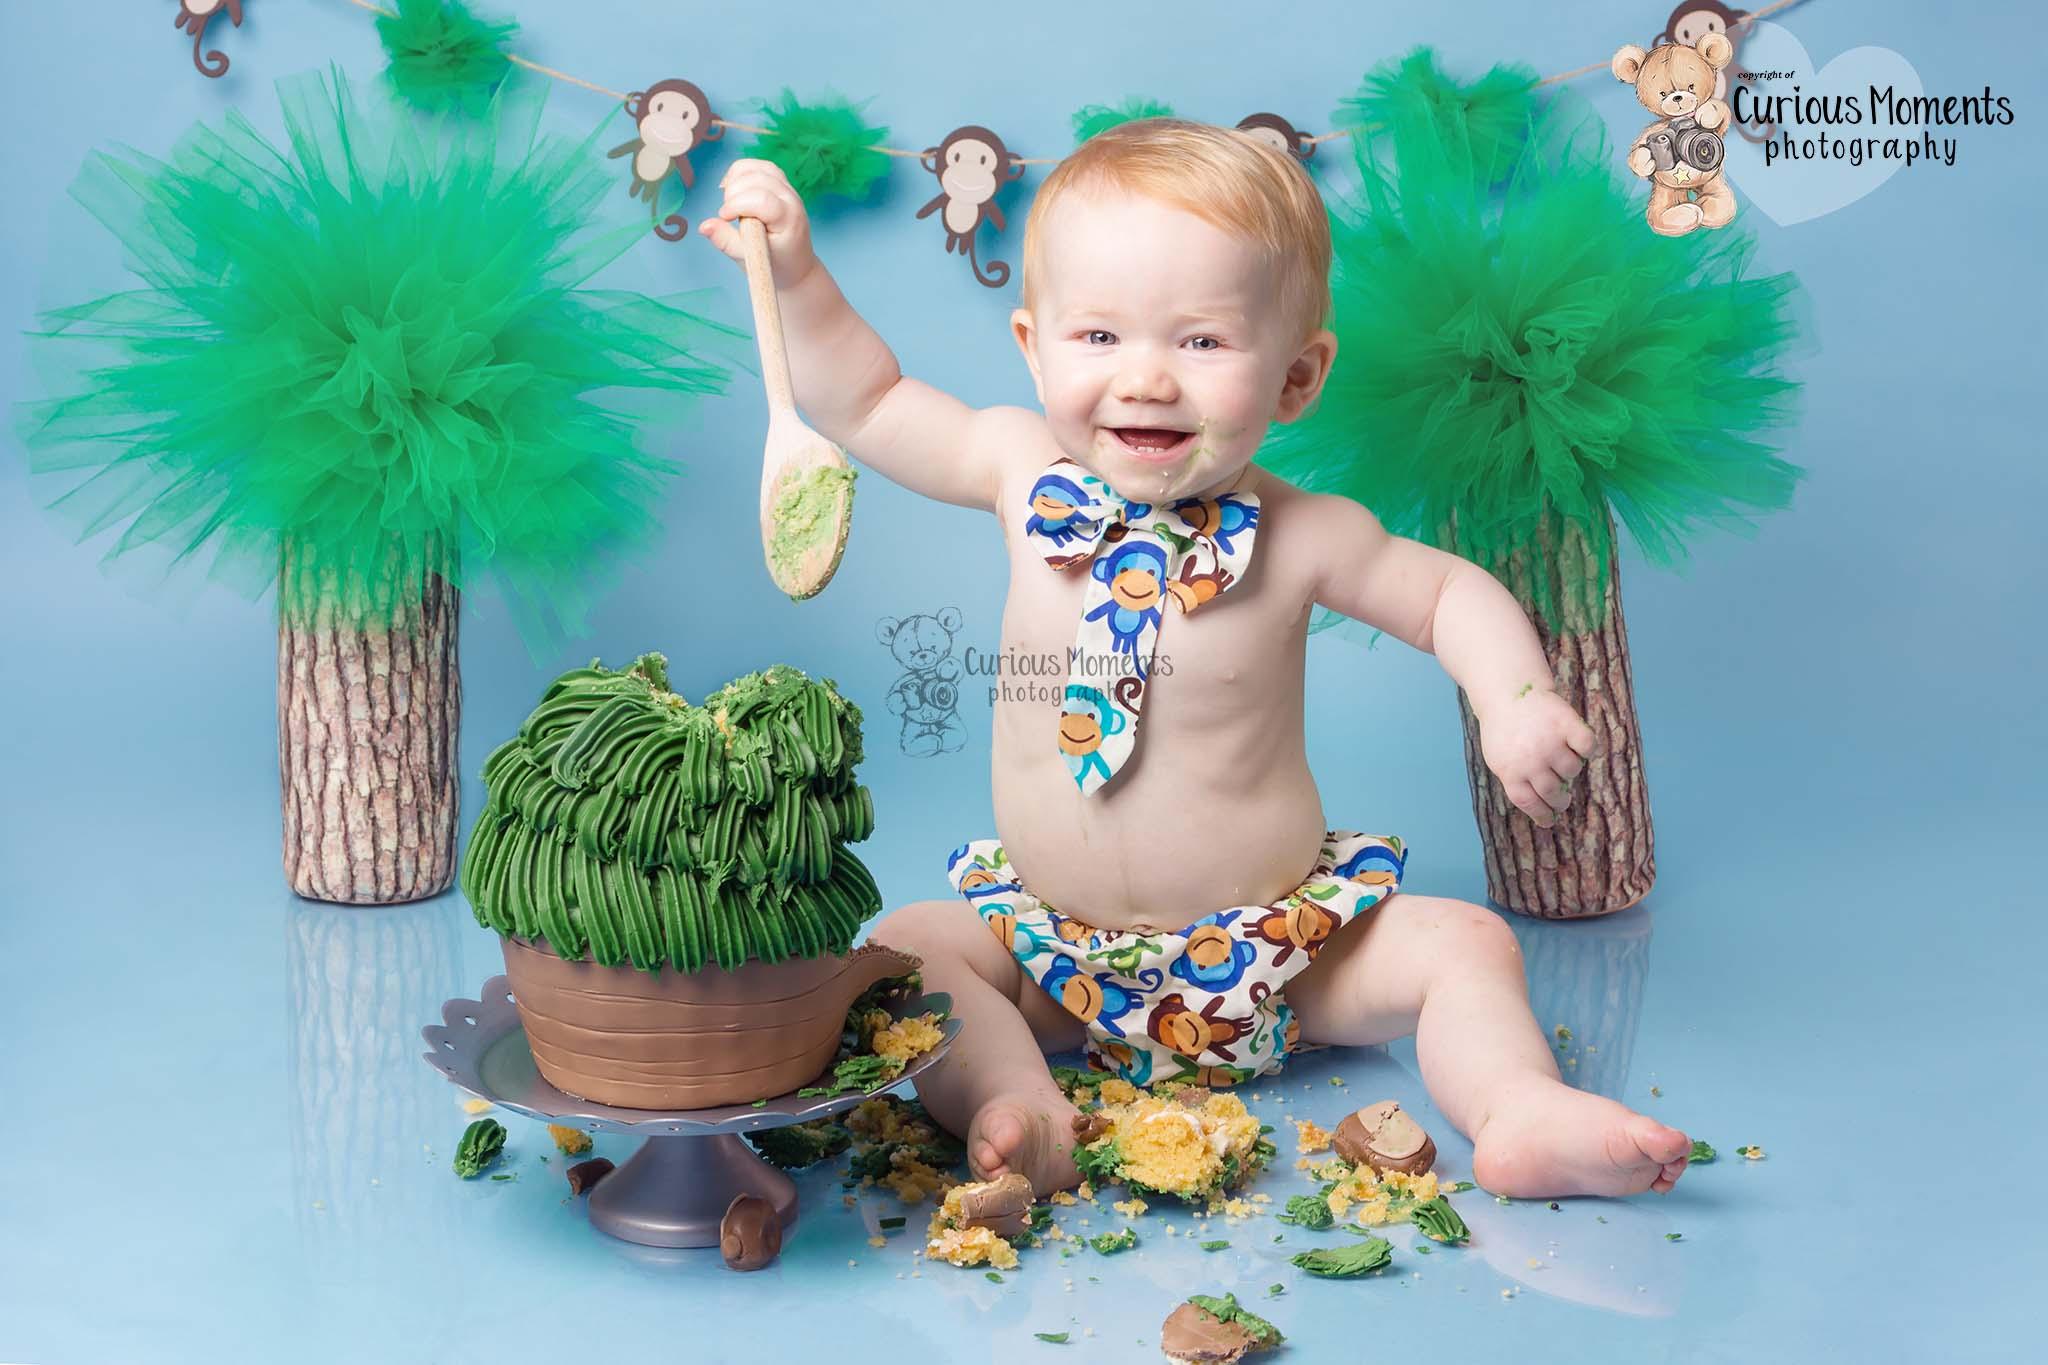 !st birthday photoshoot for little boy on blue background with ajungle Monkey themed cake smash with carmarthen photographer